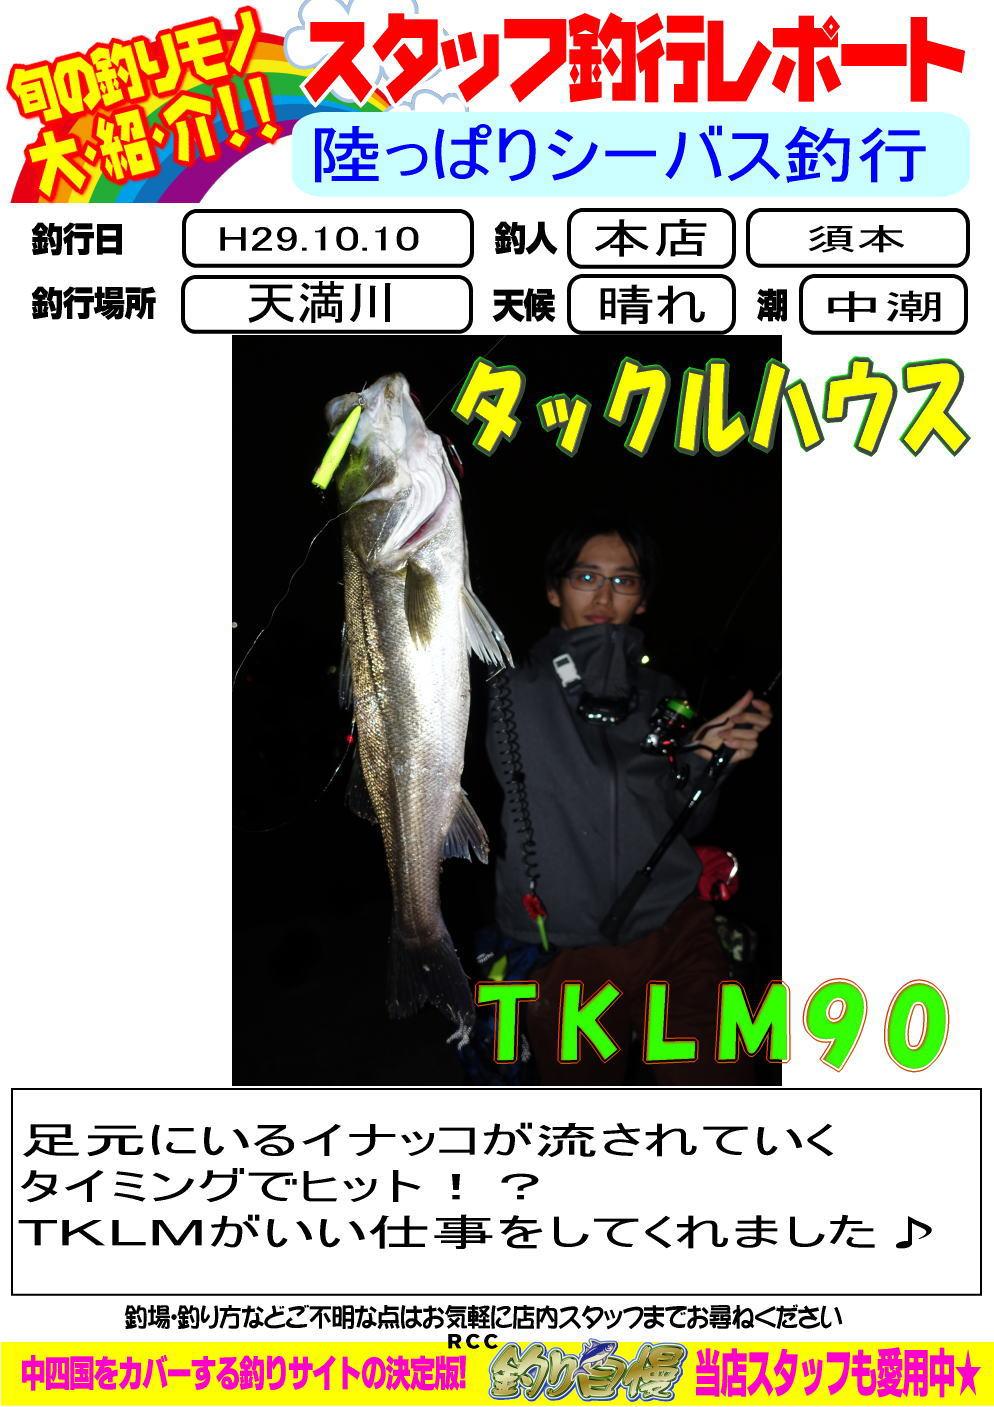 http://www.e-angle.co.jp/shop/blog/H29.10.12.jpg